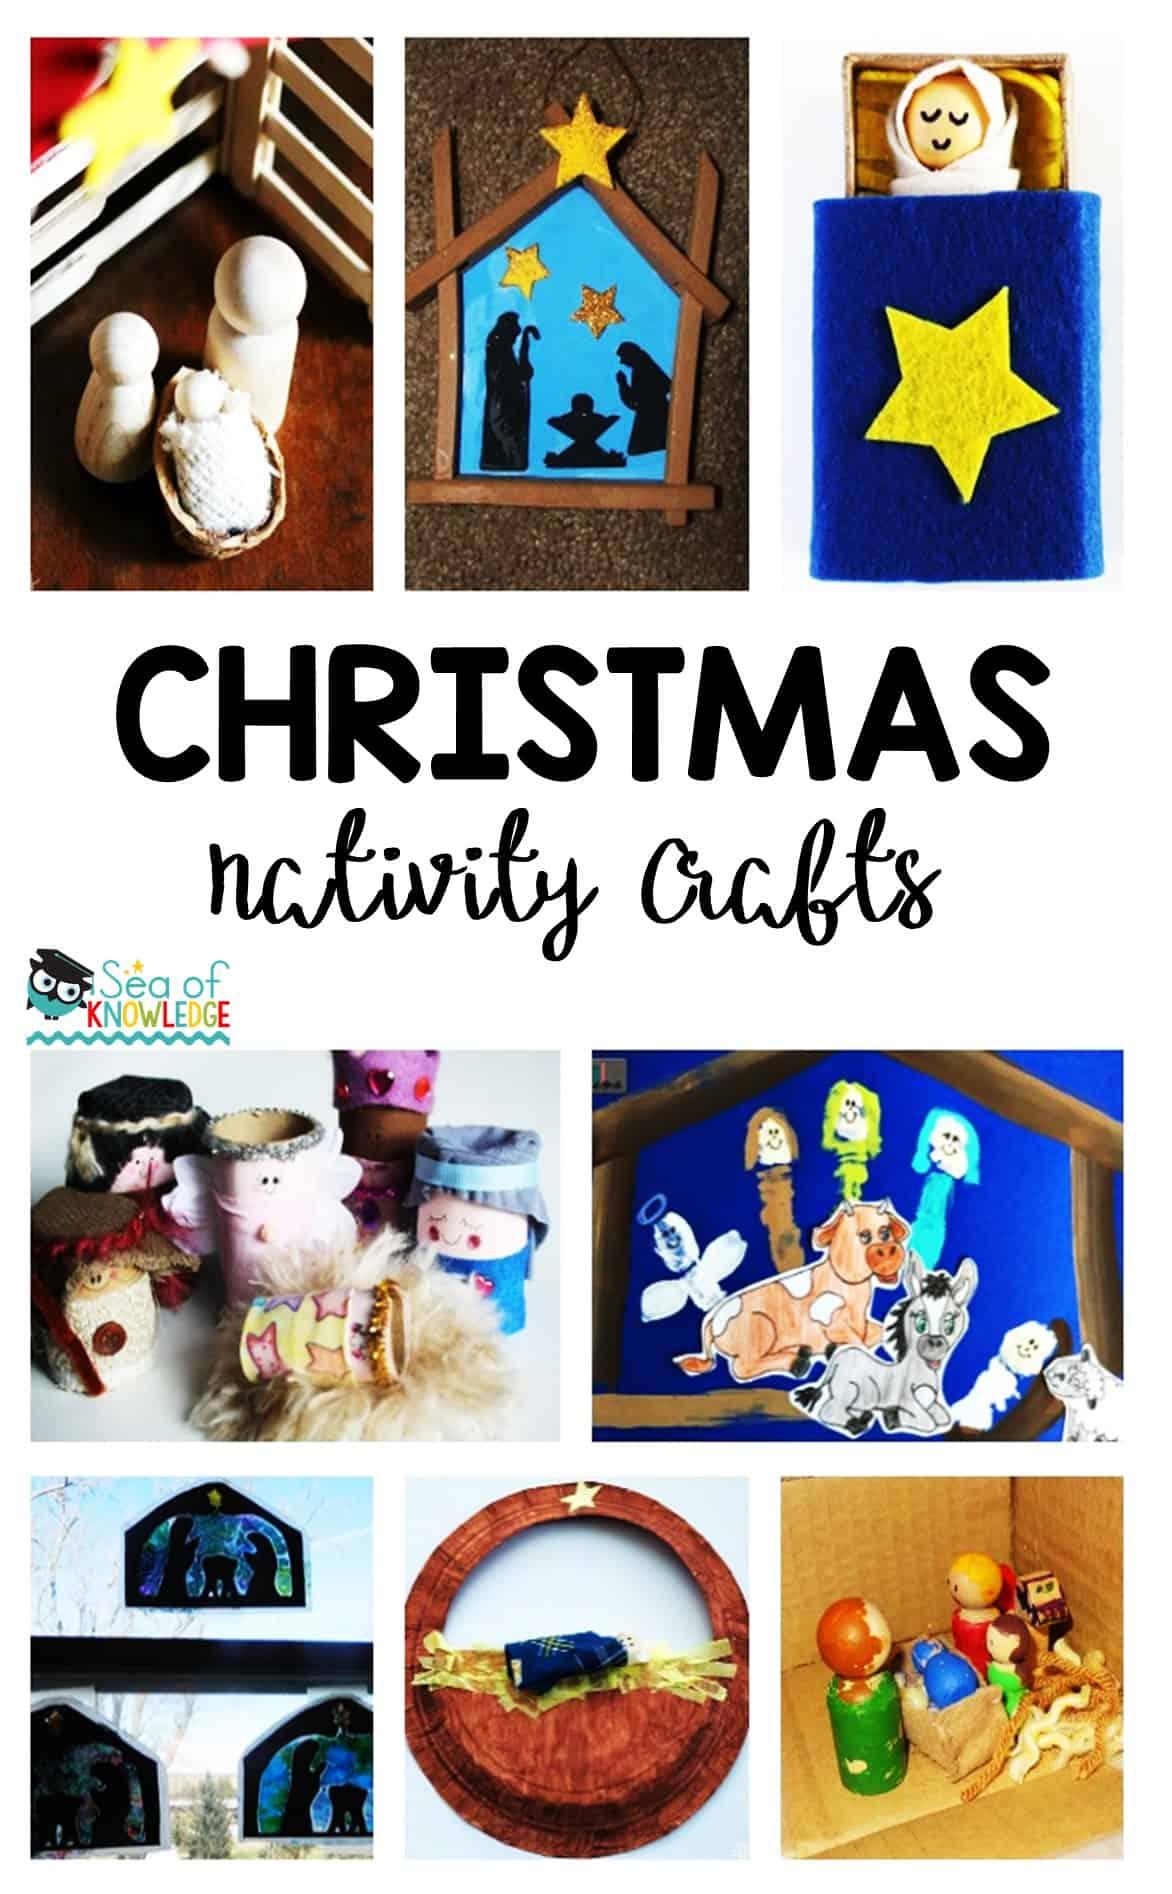 Christmas Nativity Crafts